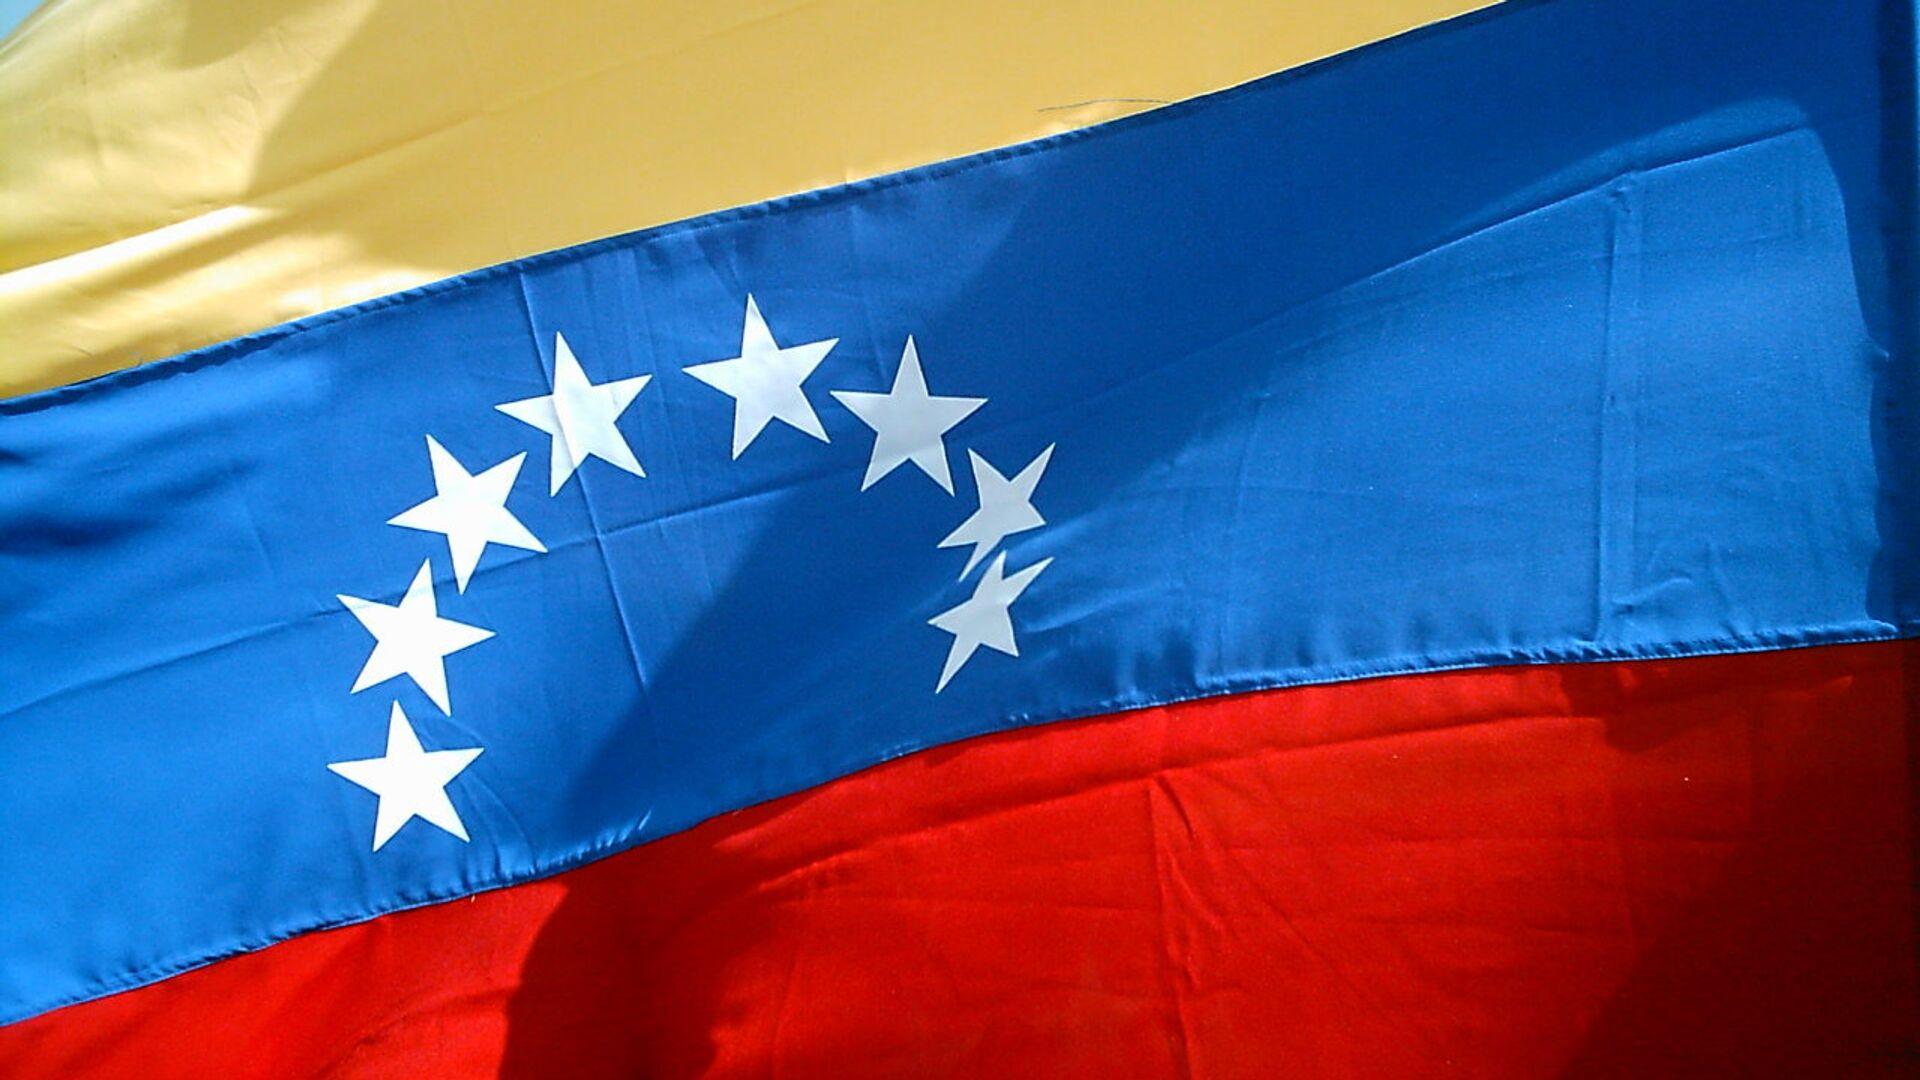 Bandera de Venezuela - Sputnik Mundo, 1920, 14.09.2021